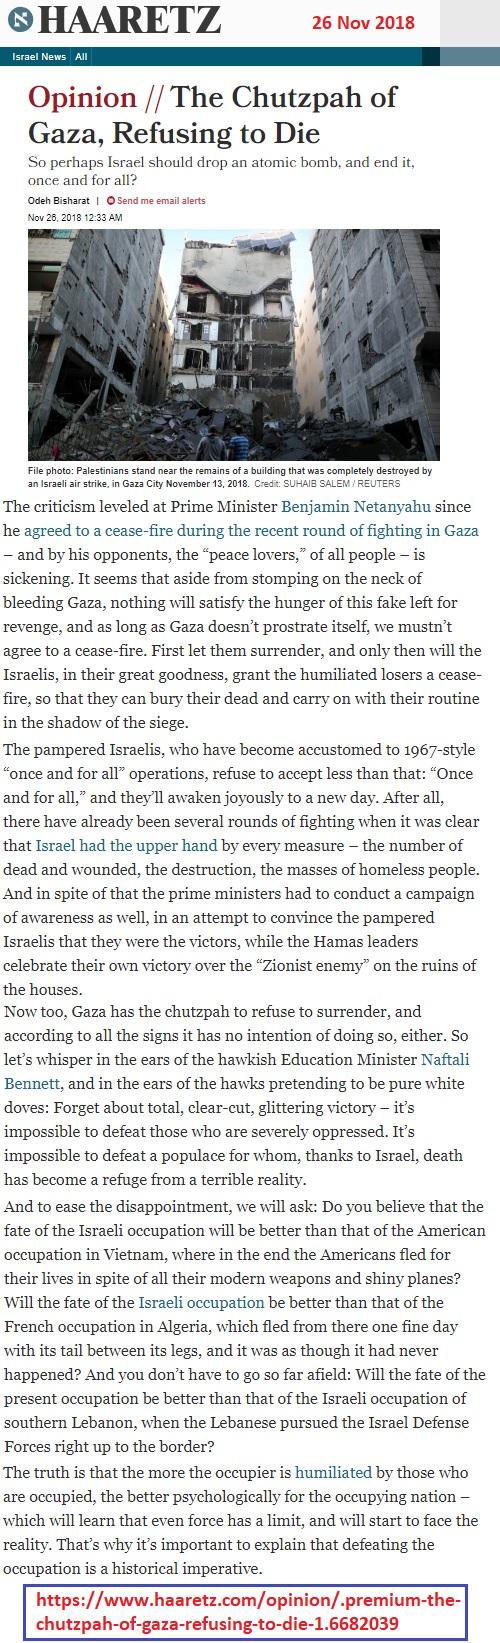 https://www.haaretz.com/opinion/.premium-the-chutzpah-of-gaza-refusing-to-die-1.6682039